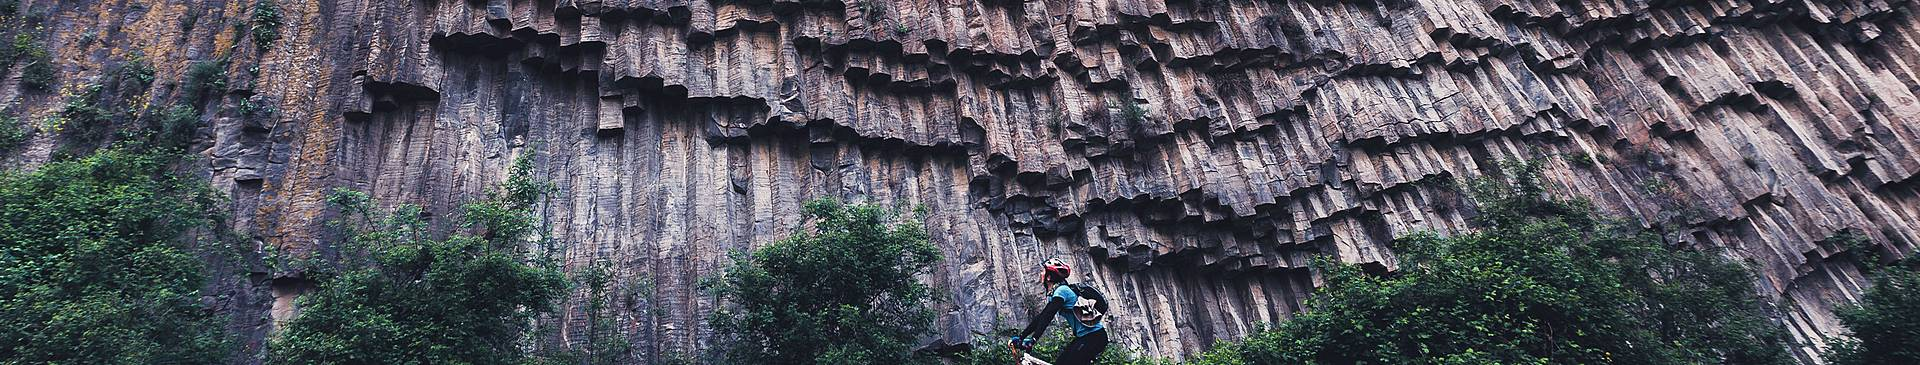 Cycling trips in Armenia